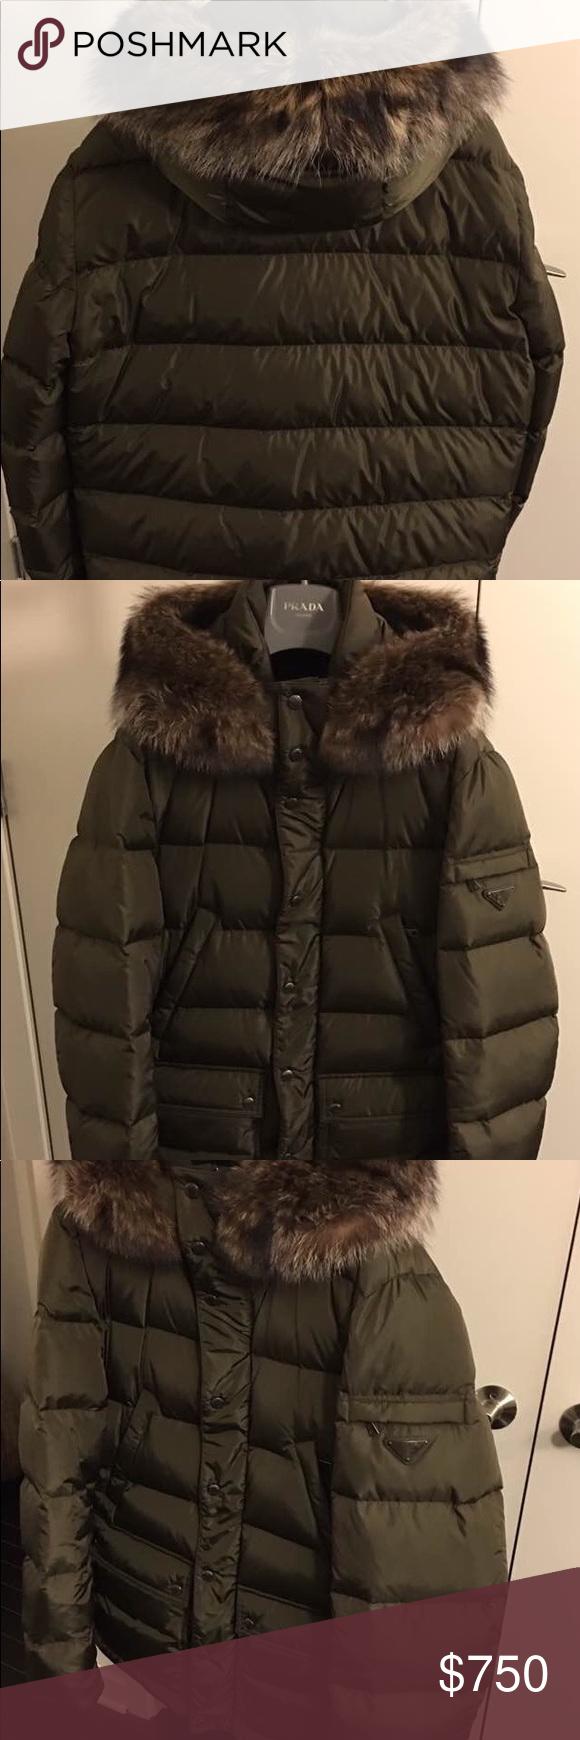 Sold Men S New Prada Down Jacket Down Jacket Jackets Clothes Design [ 1740 x 580 Pixel ]